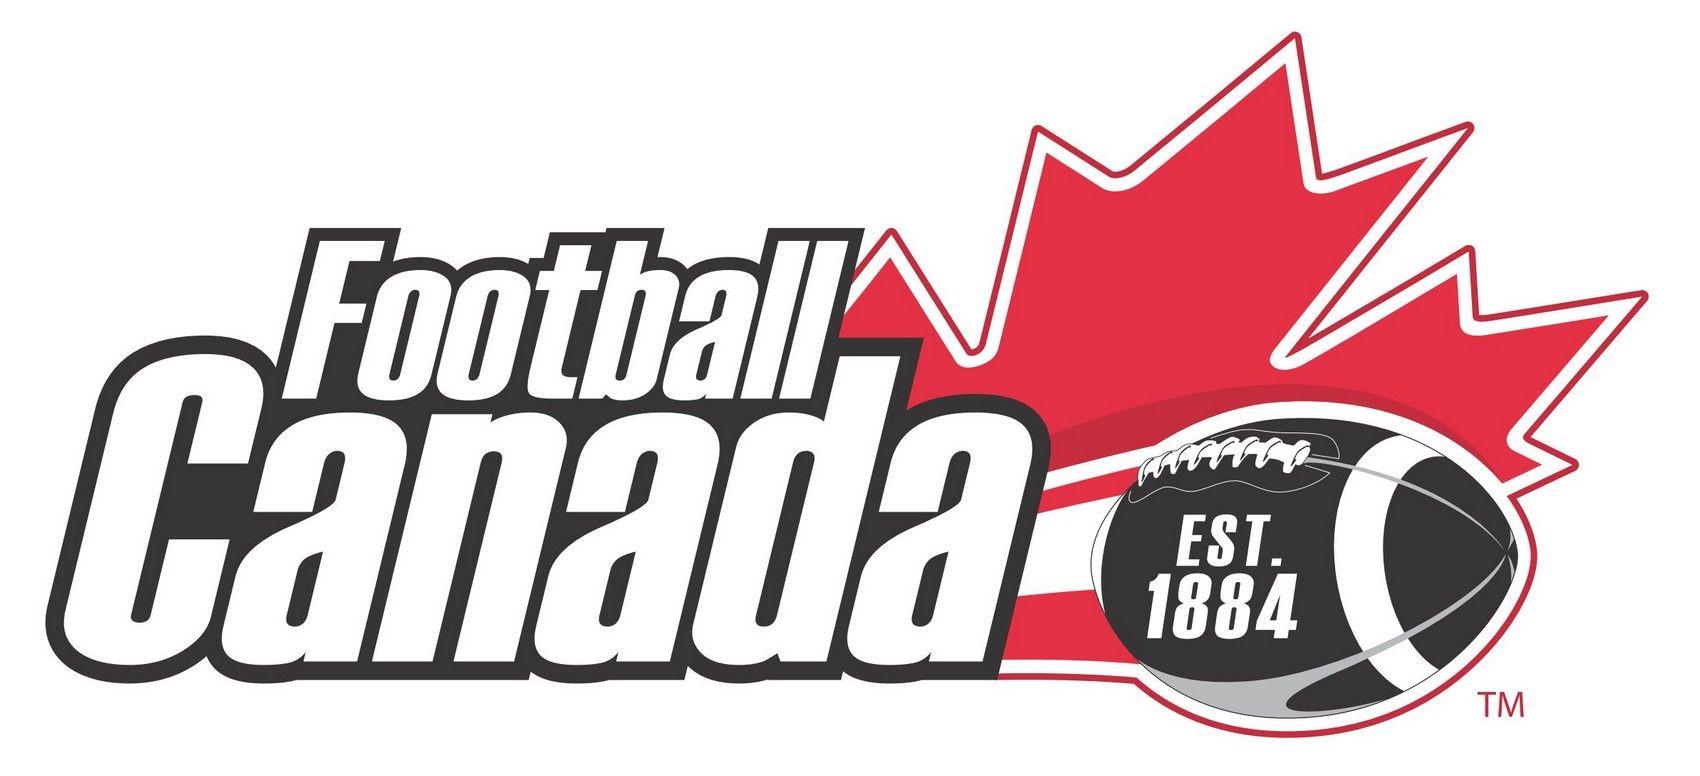 Football Canada Logo [EPS File] American football